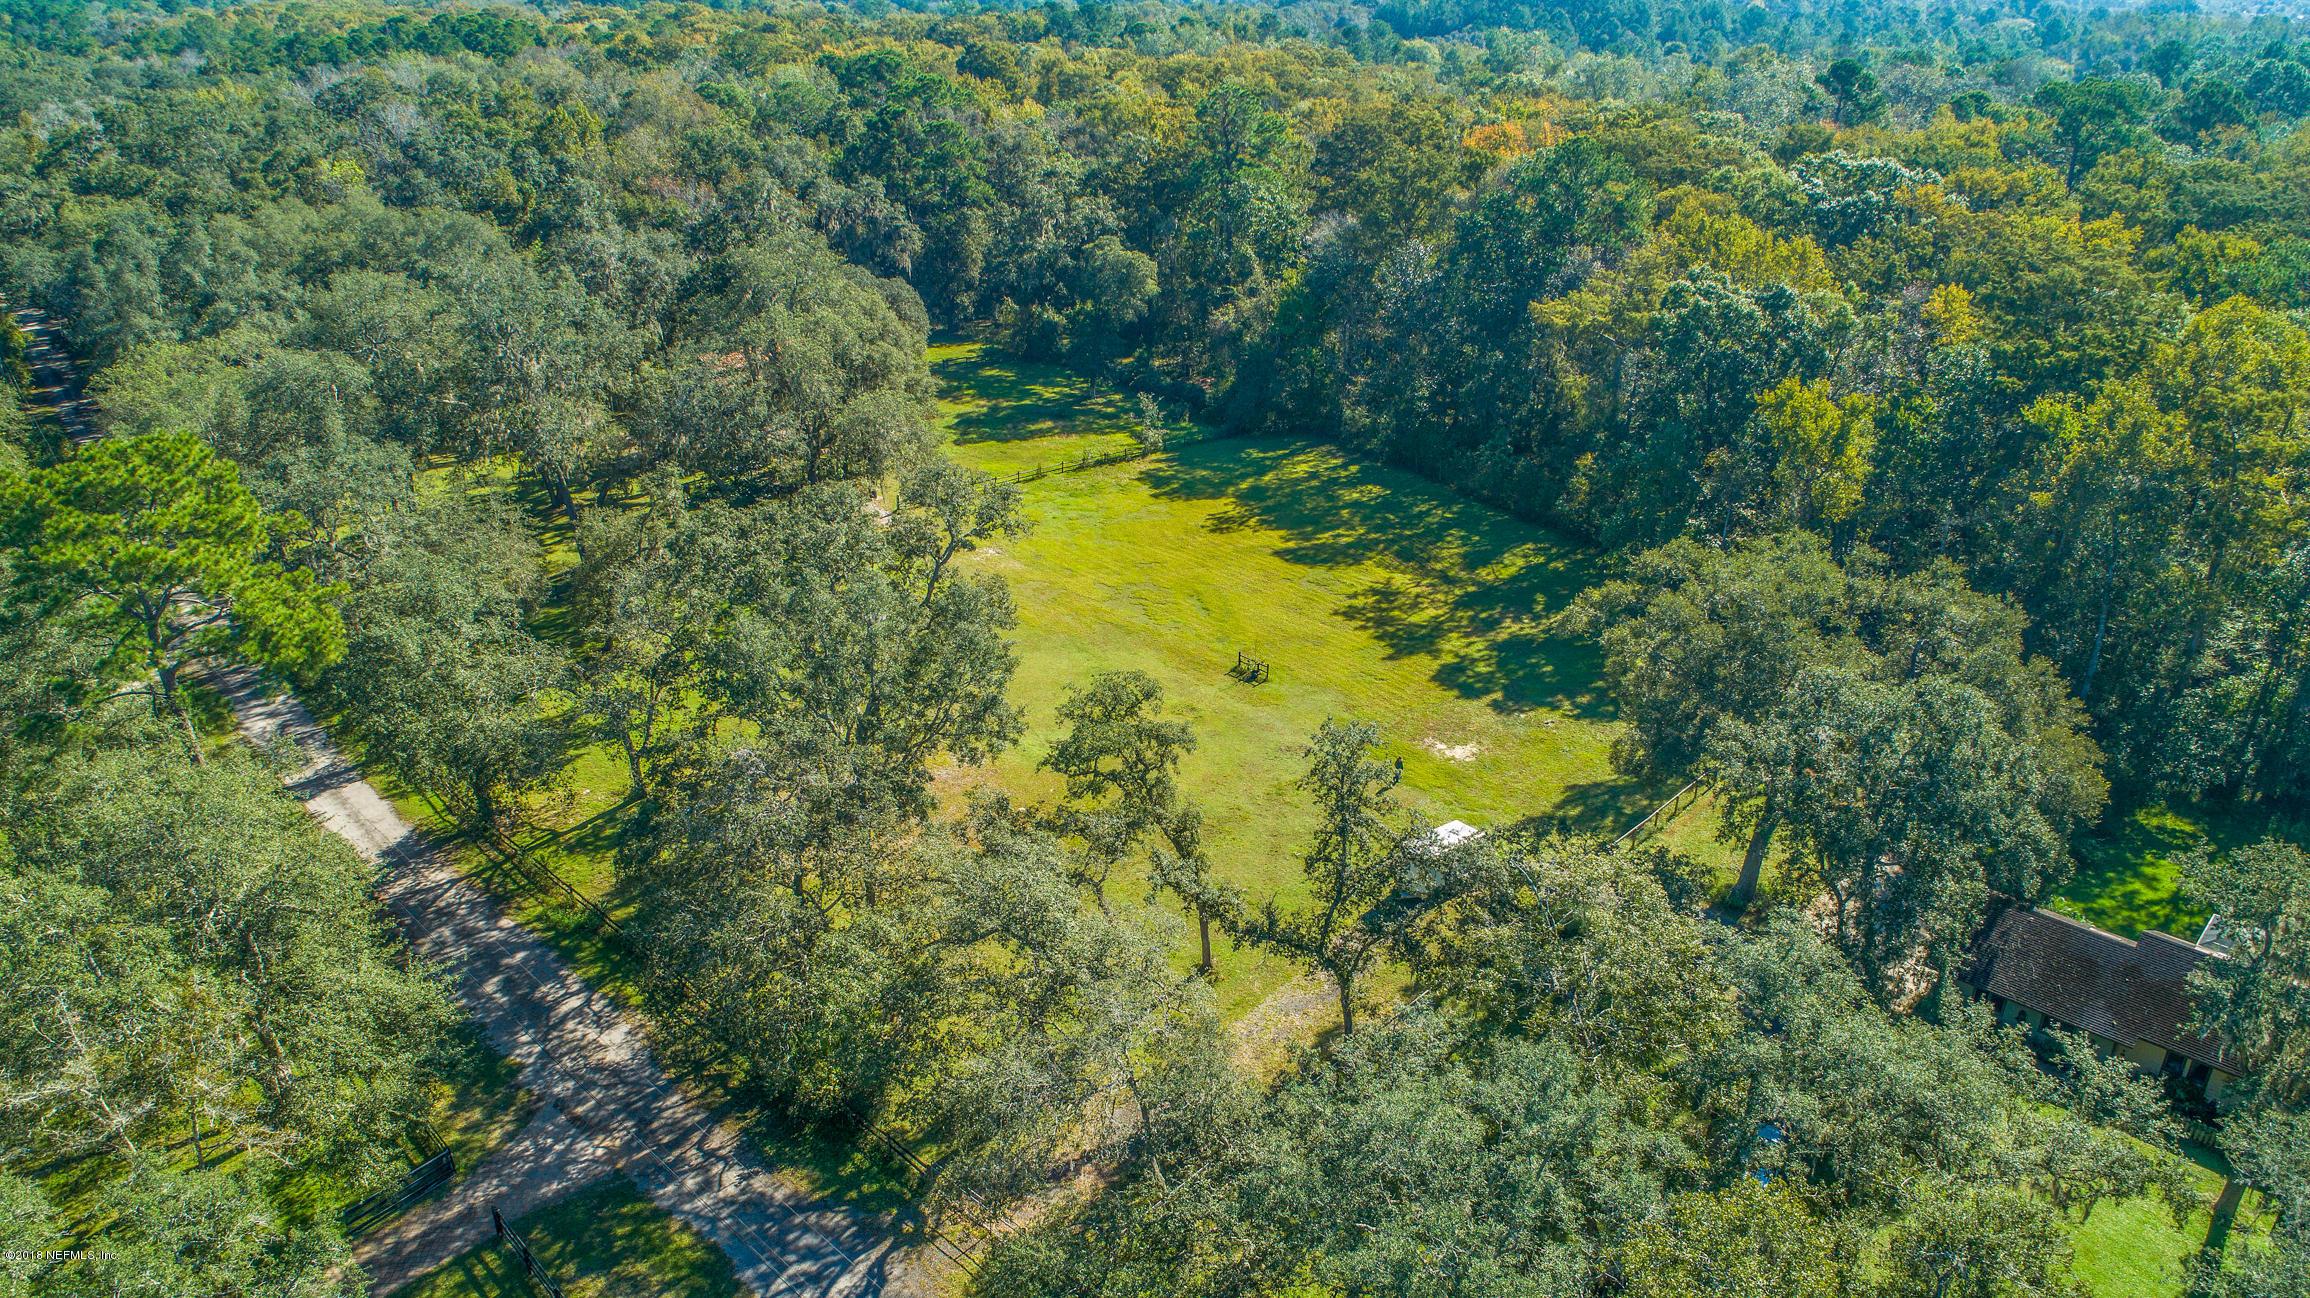 570-A OAKRIDGE, ST AUGUSTINE, FLORIDA 32092, ,Vacant land,For sale,OAKRIDGE,964522